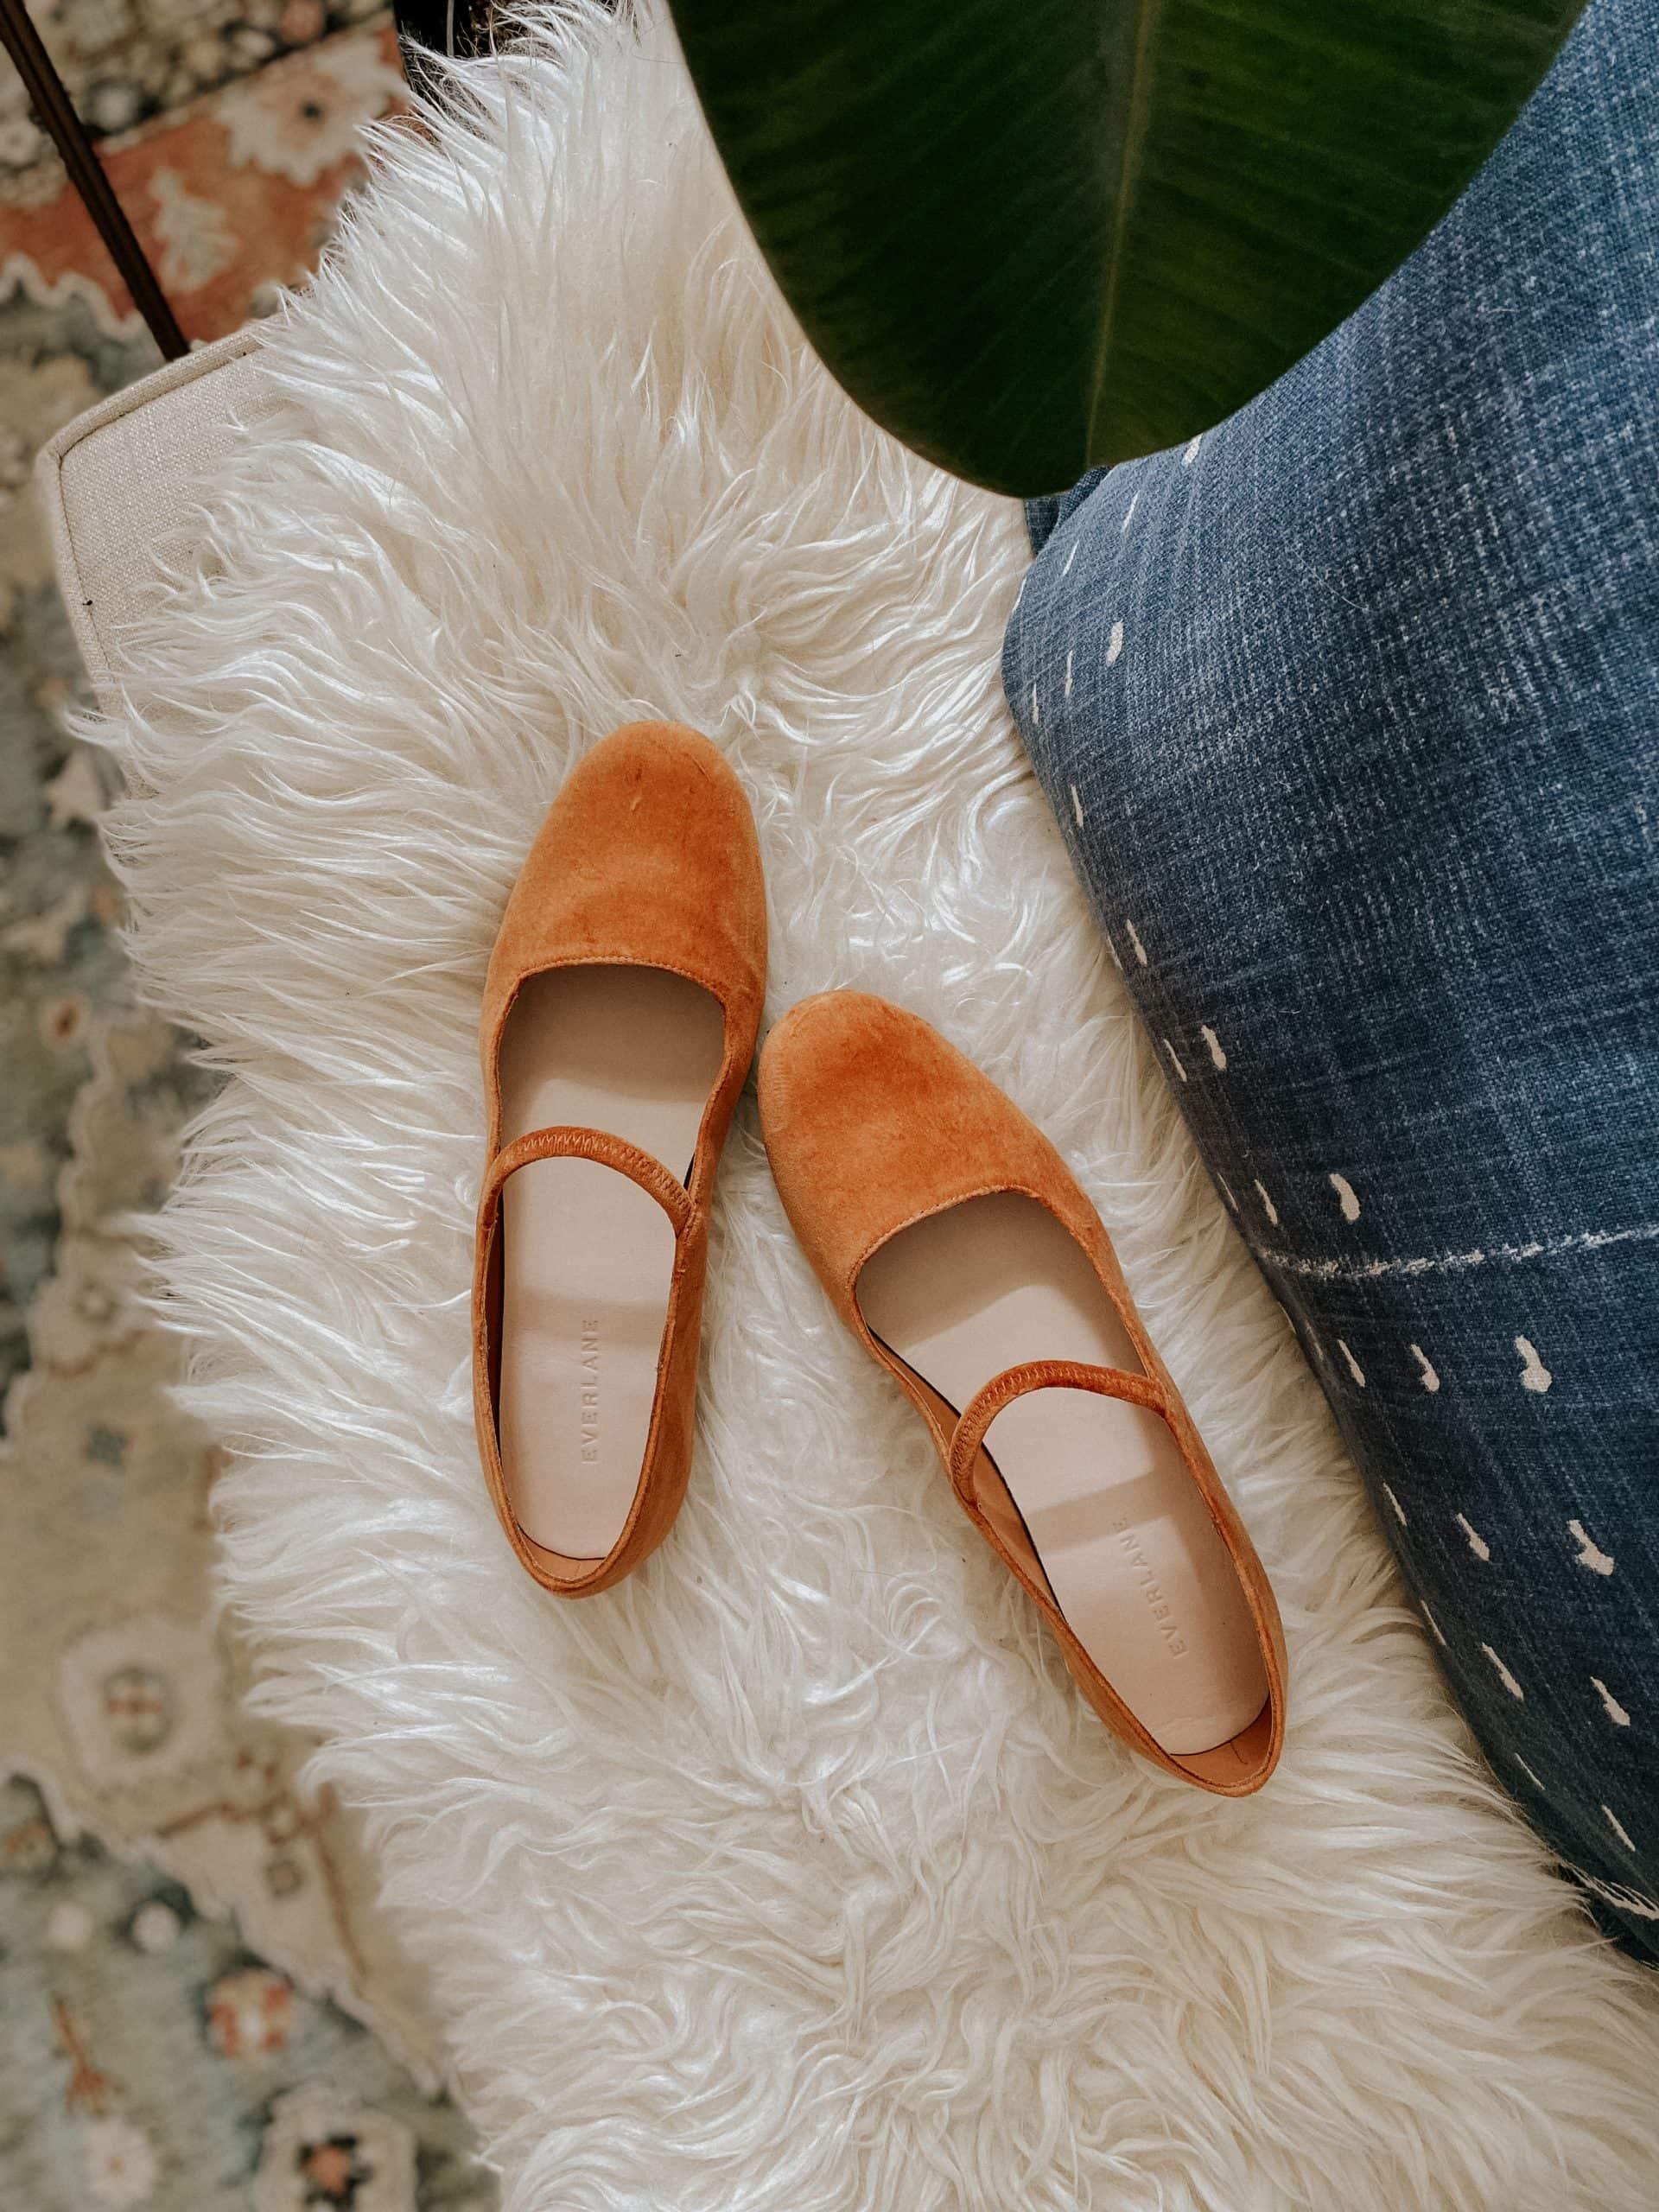 Everlane product reviews: Velvet Mary Jane Shoes